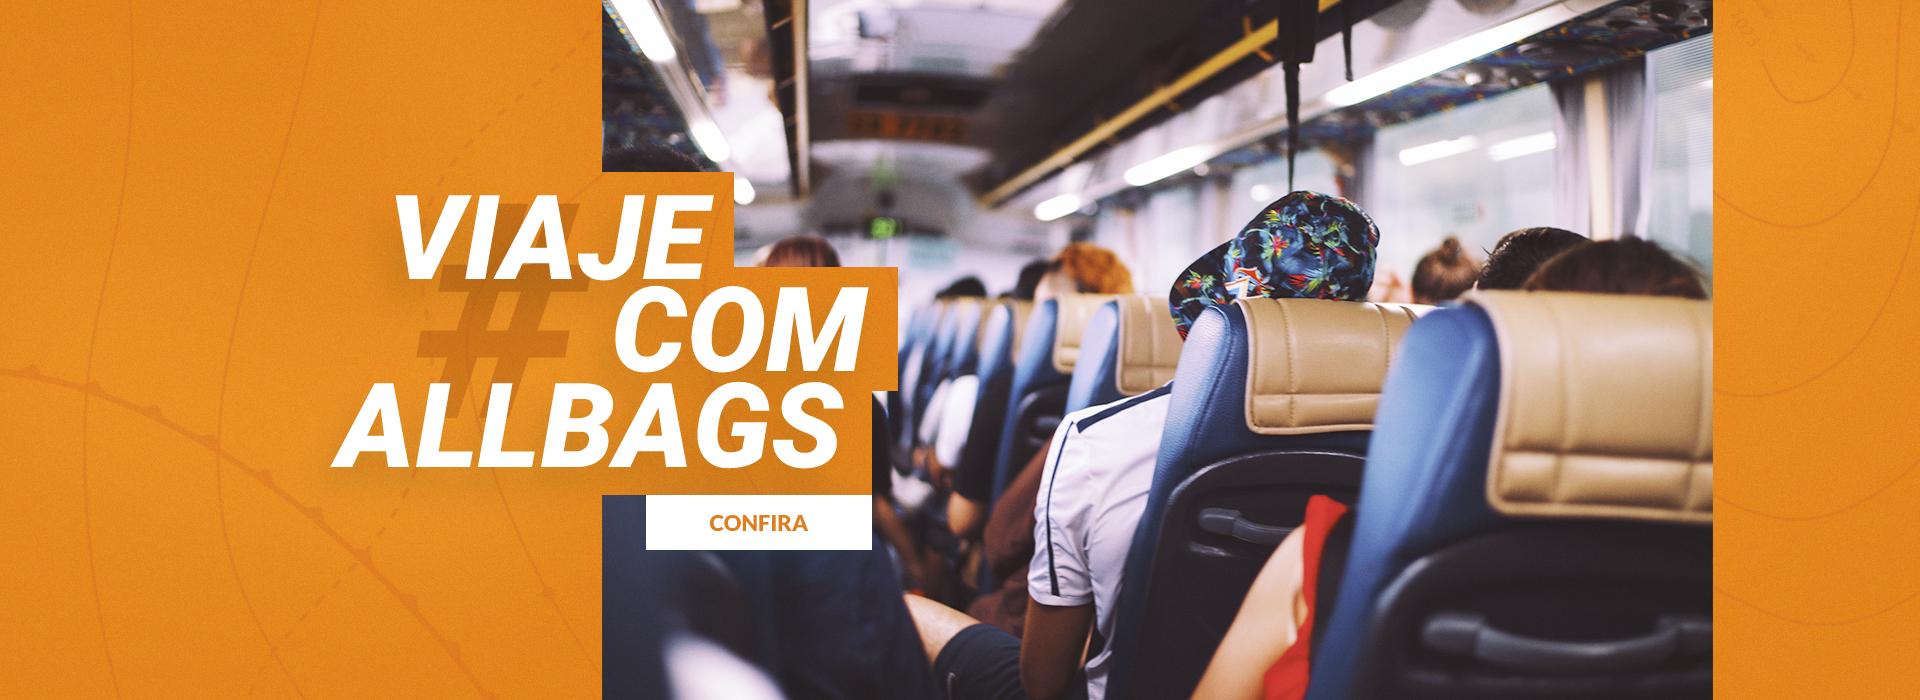 Banner 4 - viajecomallbags